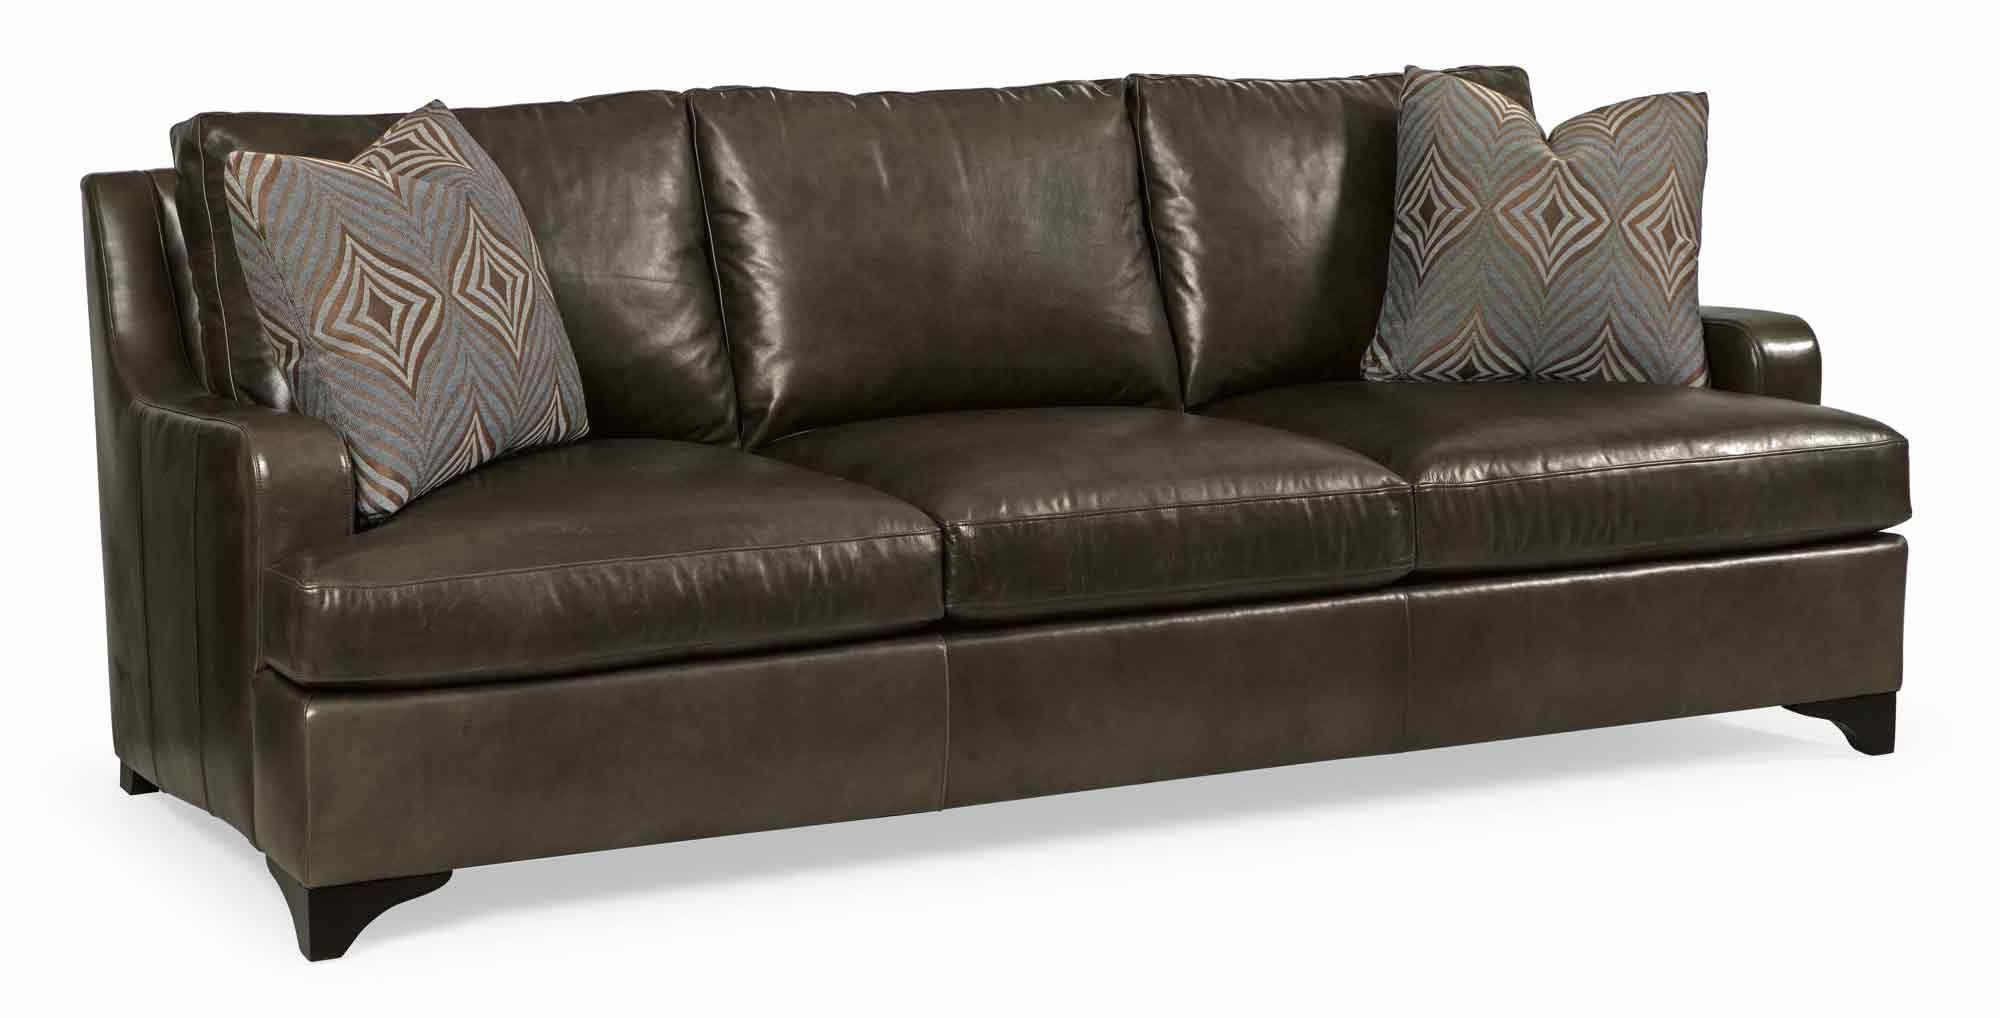 Bernhardt Mitchell Sofa 9077l My Style Furniture